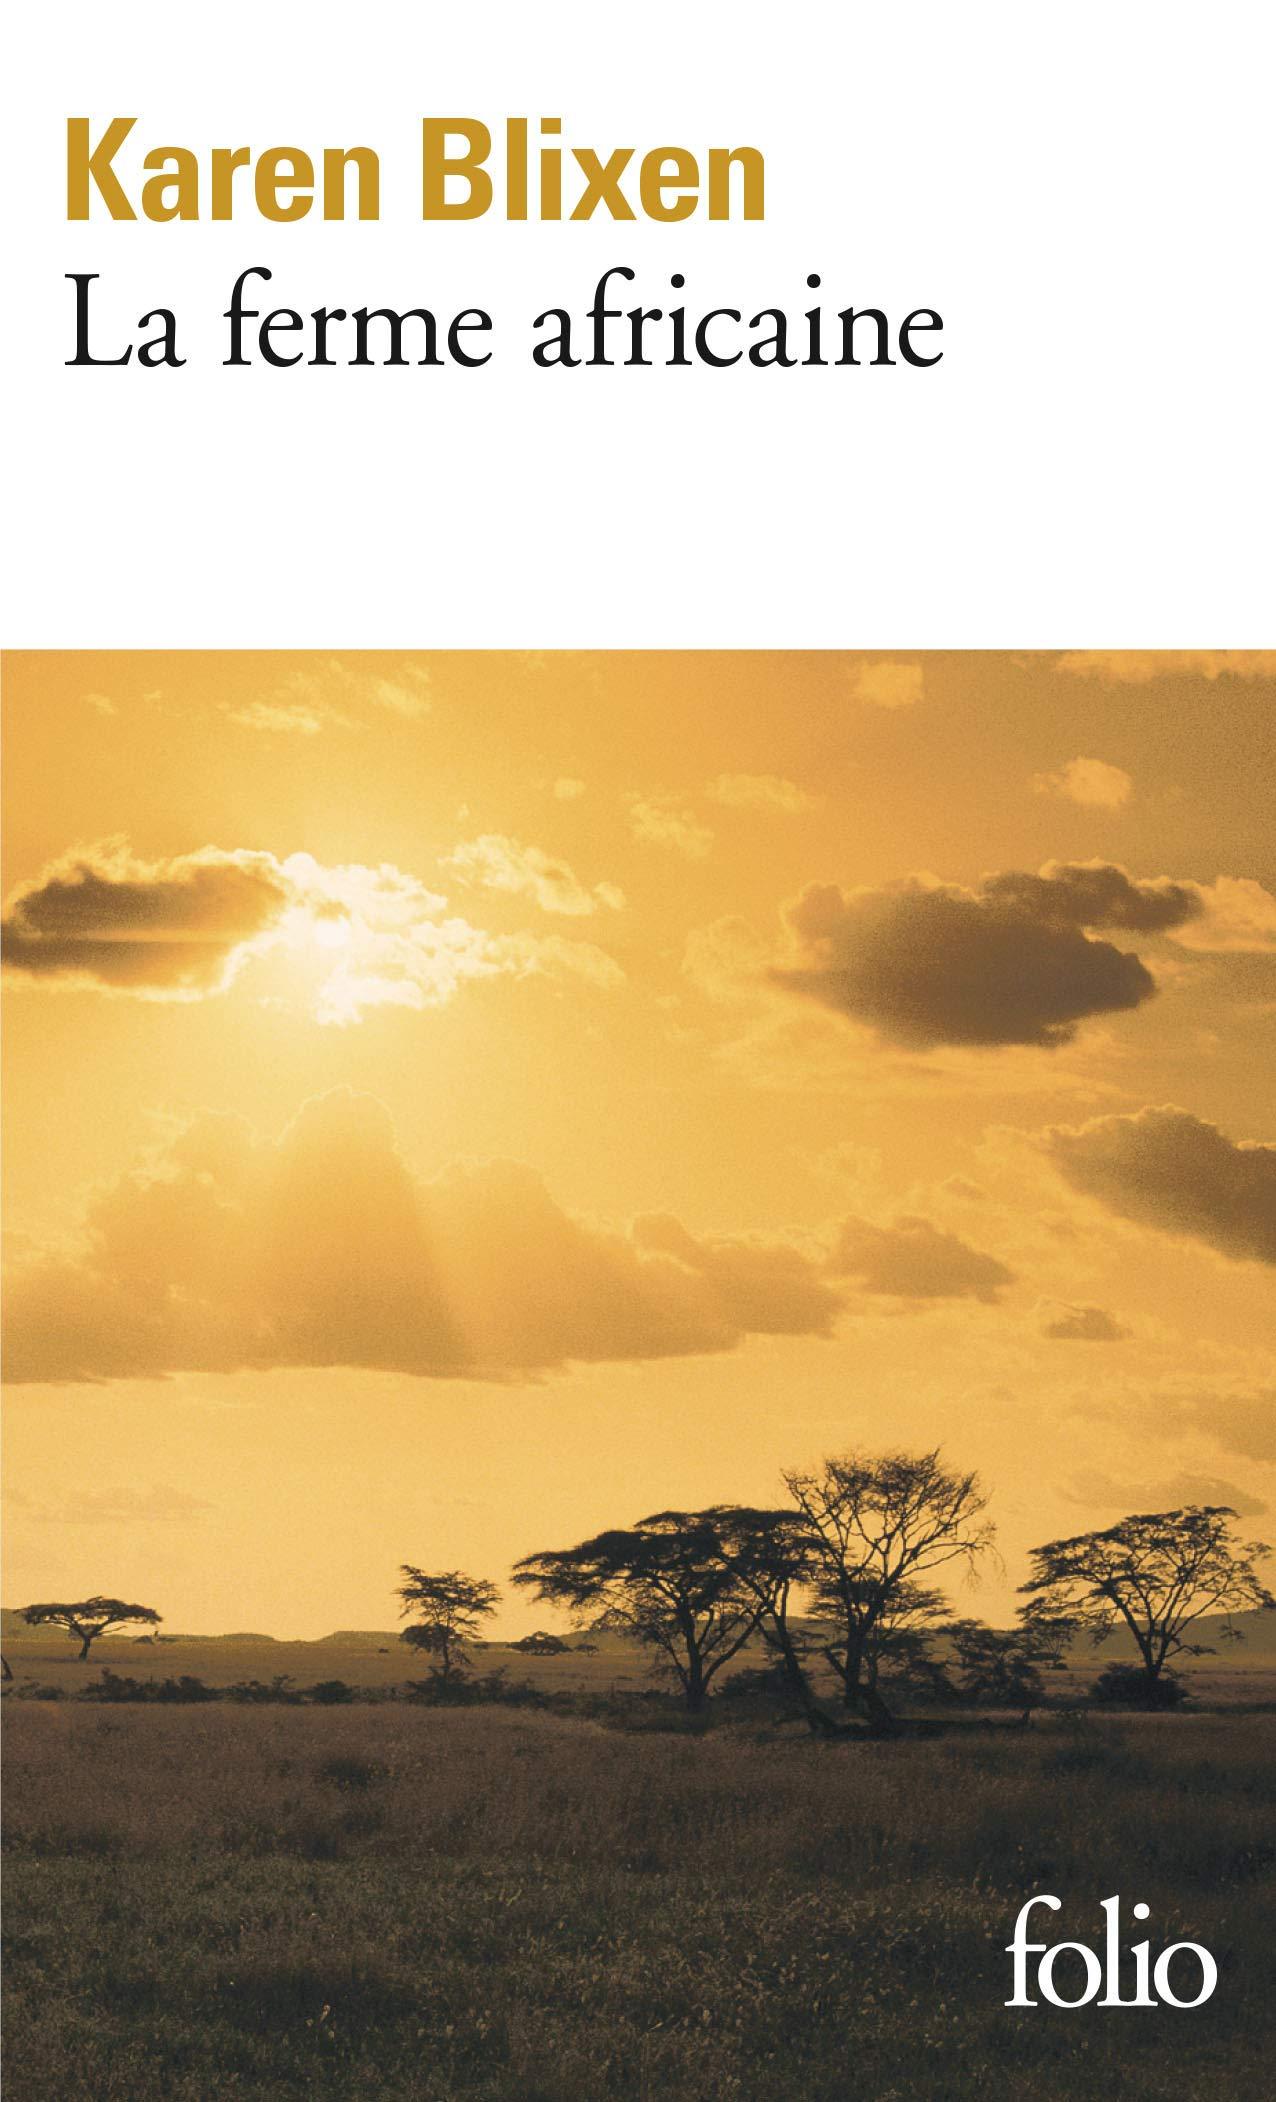 Amazon.fr - La ferme africaine - Karen Blixen, Alain Gnaedig - Livres